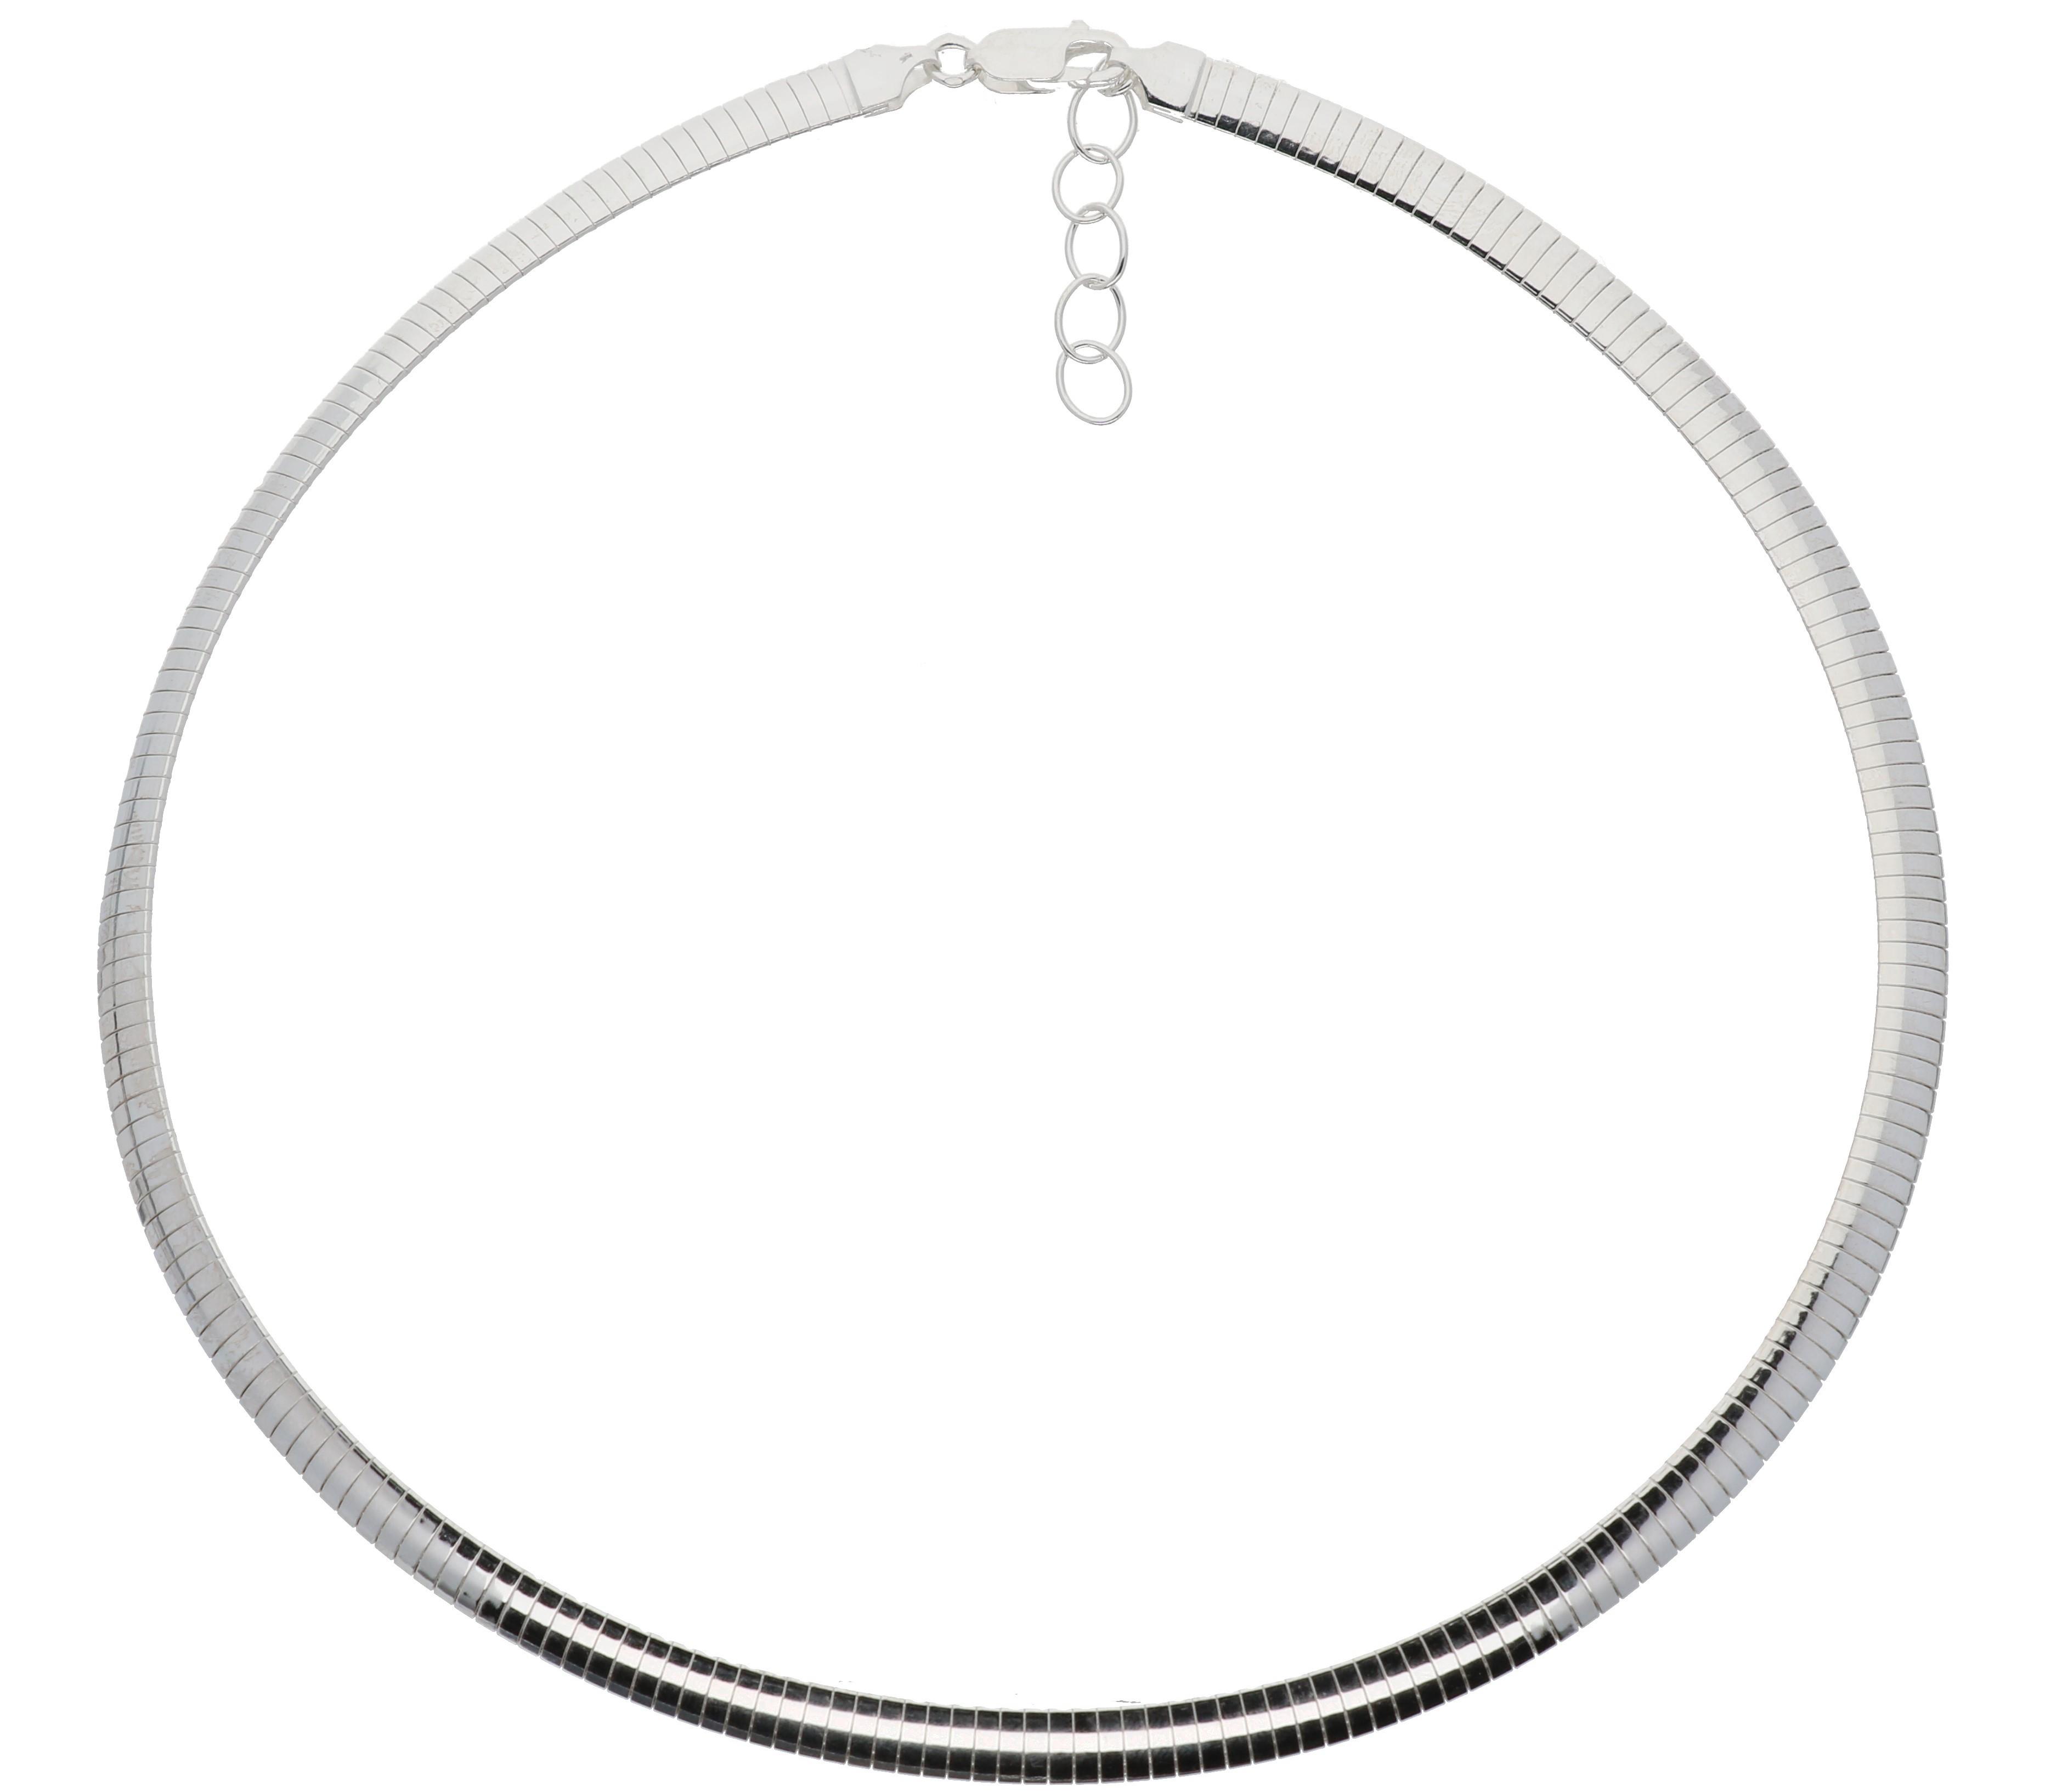 Zilveren omegacollier best basics Halfrond 6.0 mm 103.7039.43